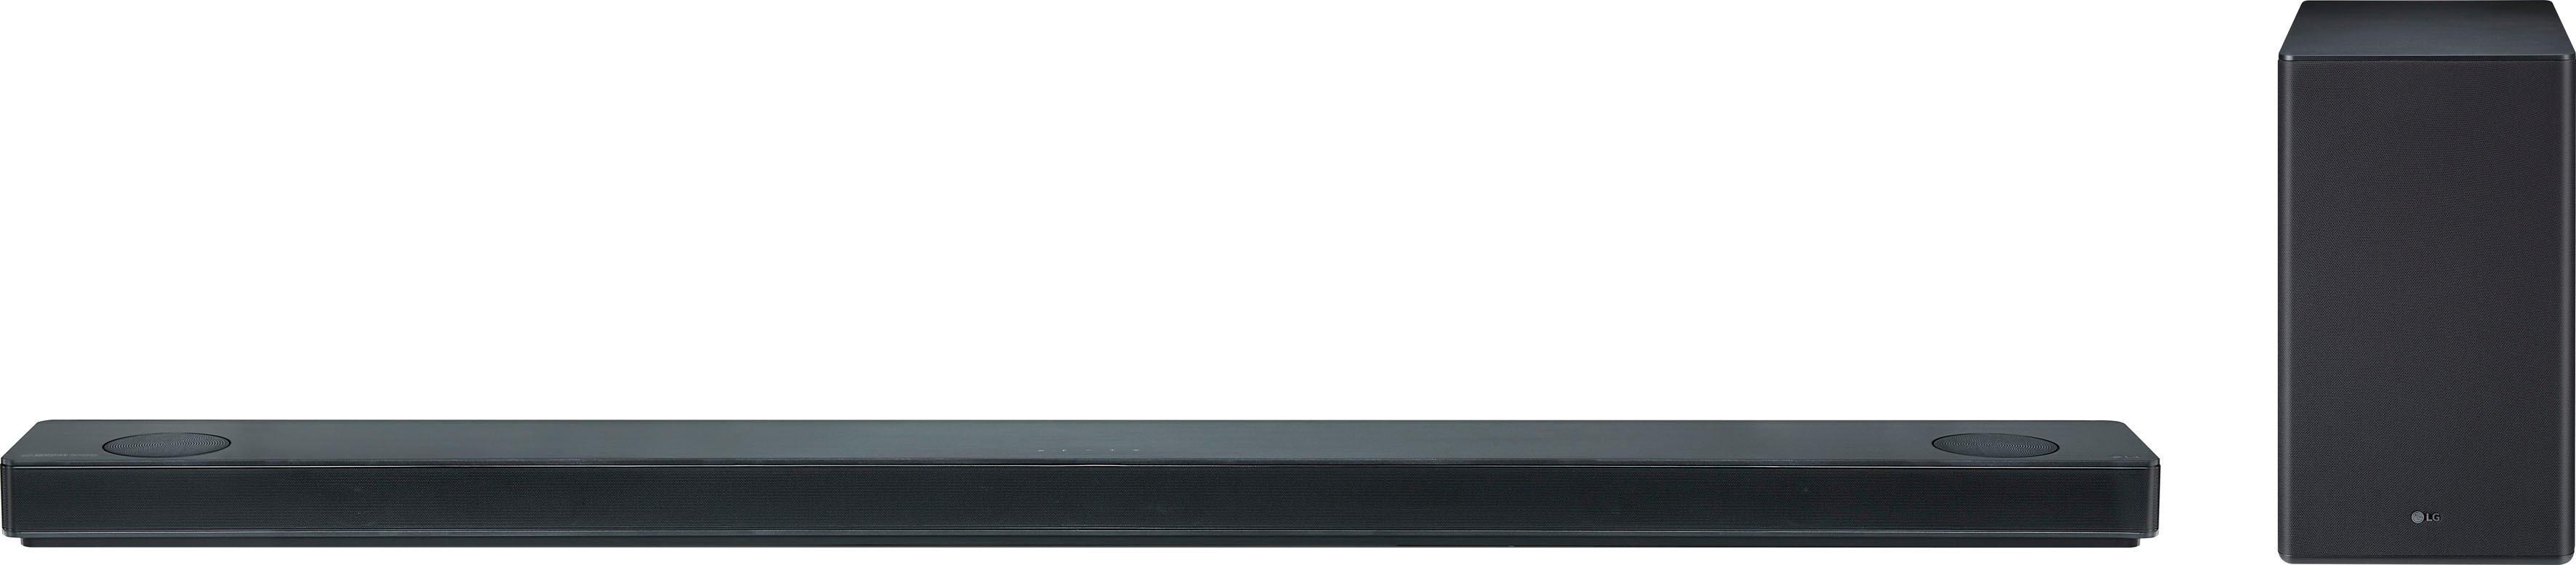 LG »SK10Y« soundbar (bluetooth, wifi, LAN (ethernet), Hi-Res, Chromecast, Google Assistant, 550 W) nu online kopen bij OTTO